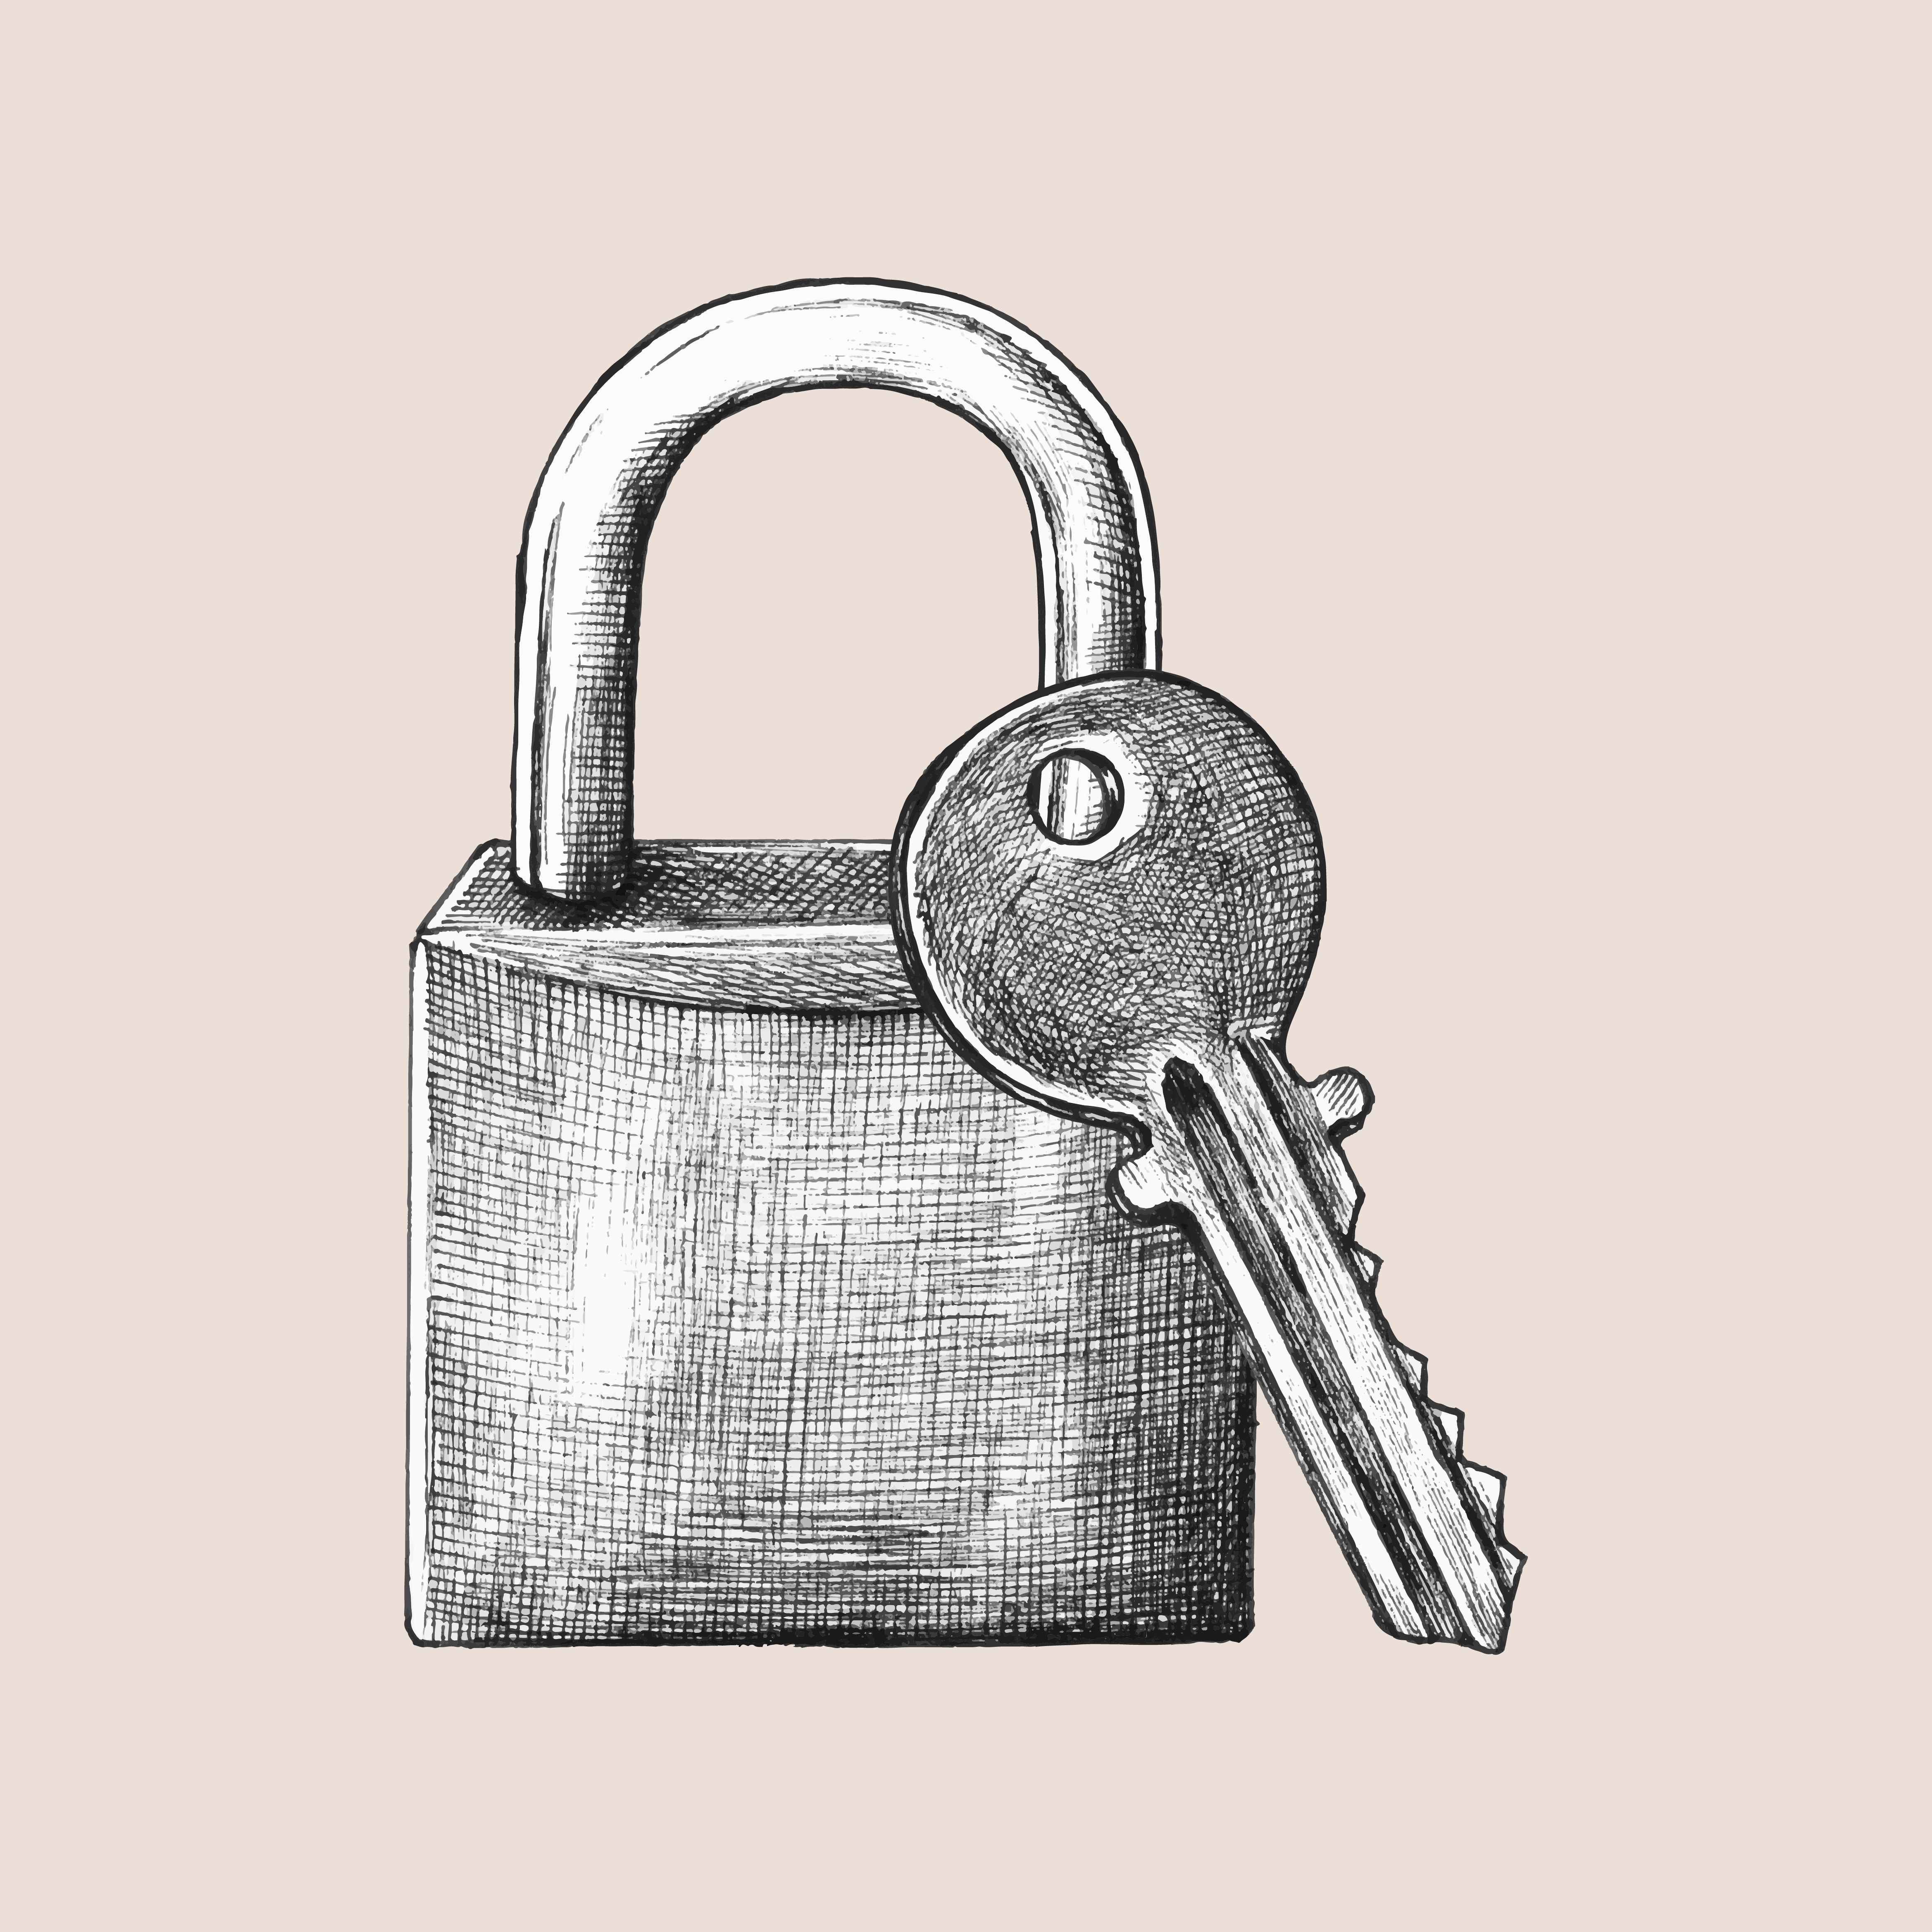 Vector Key Illustration: Hand-drawn Lock And Key Illustration